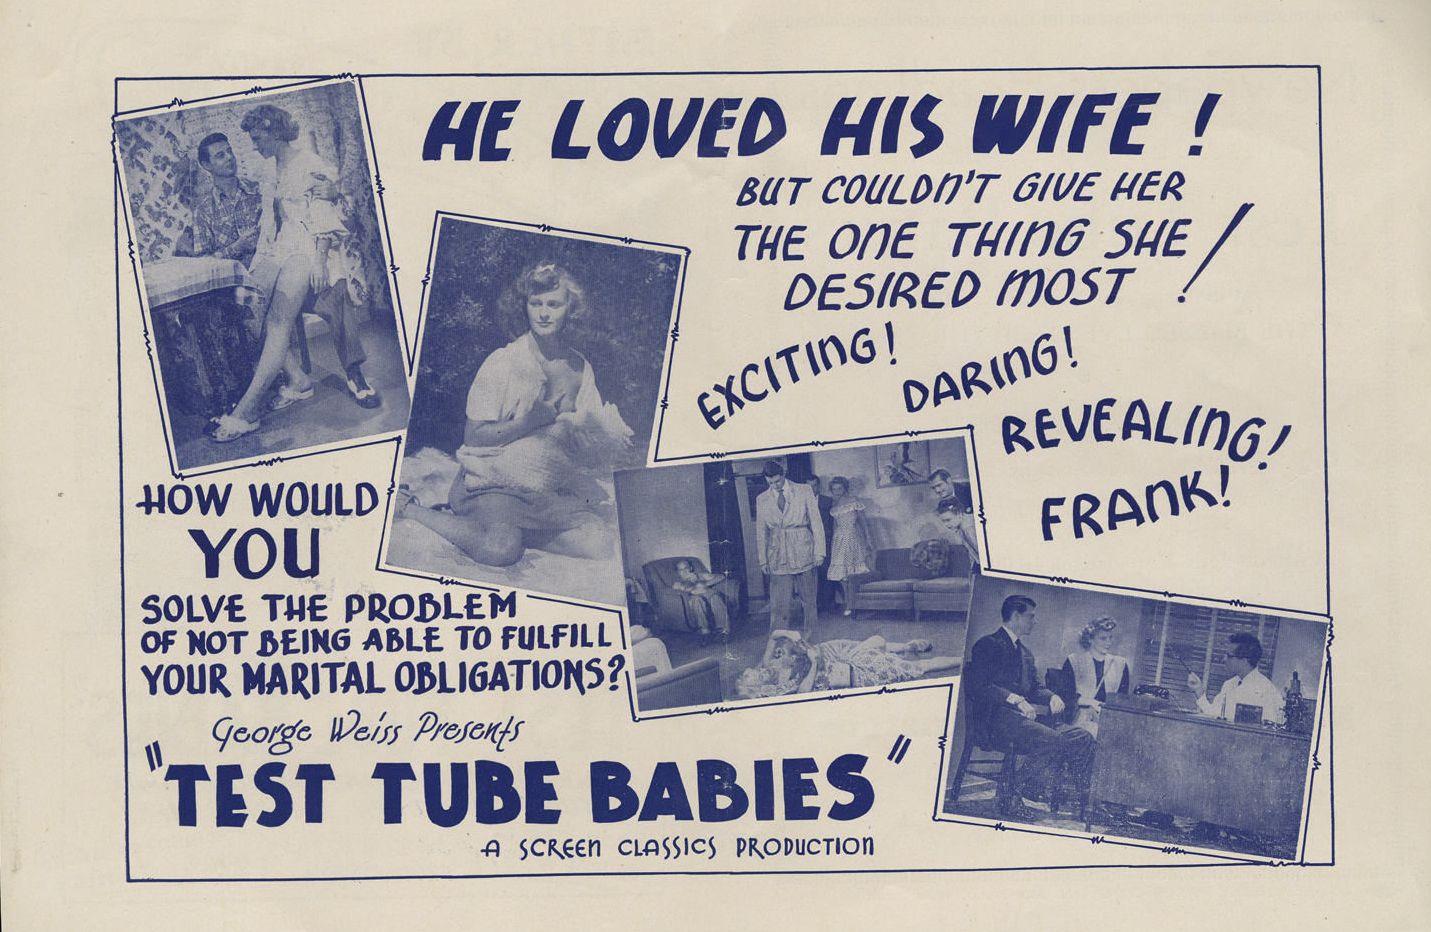 Test Tube Babies (1948)